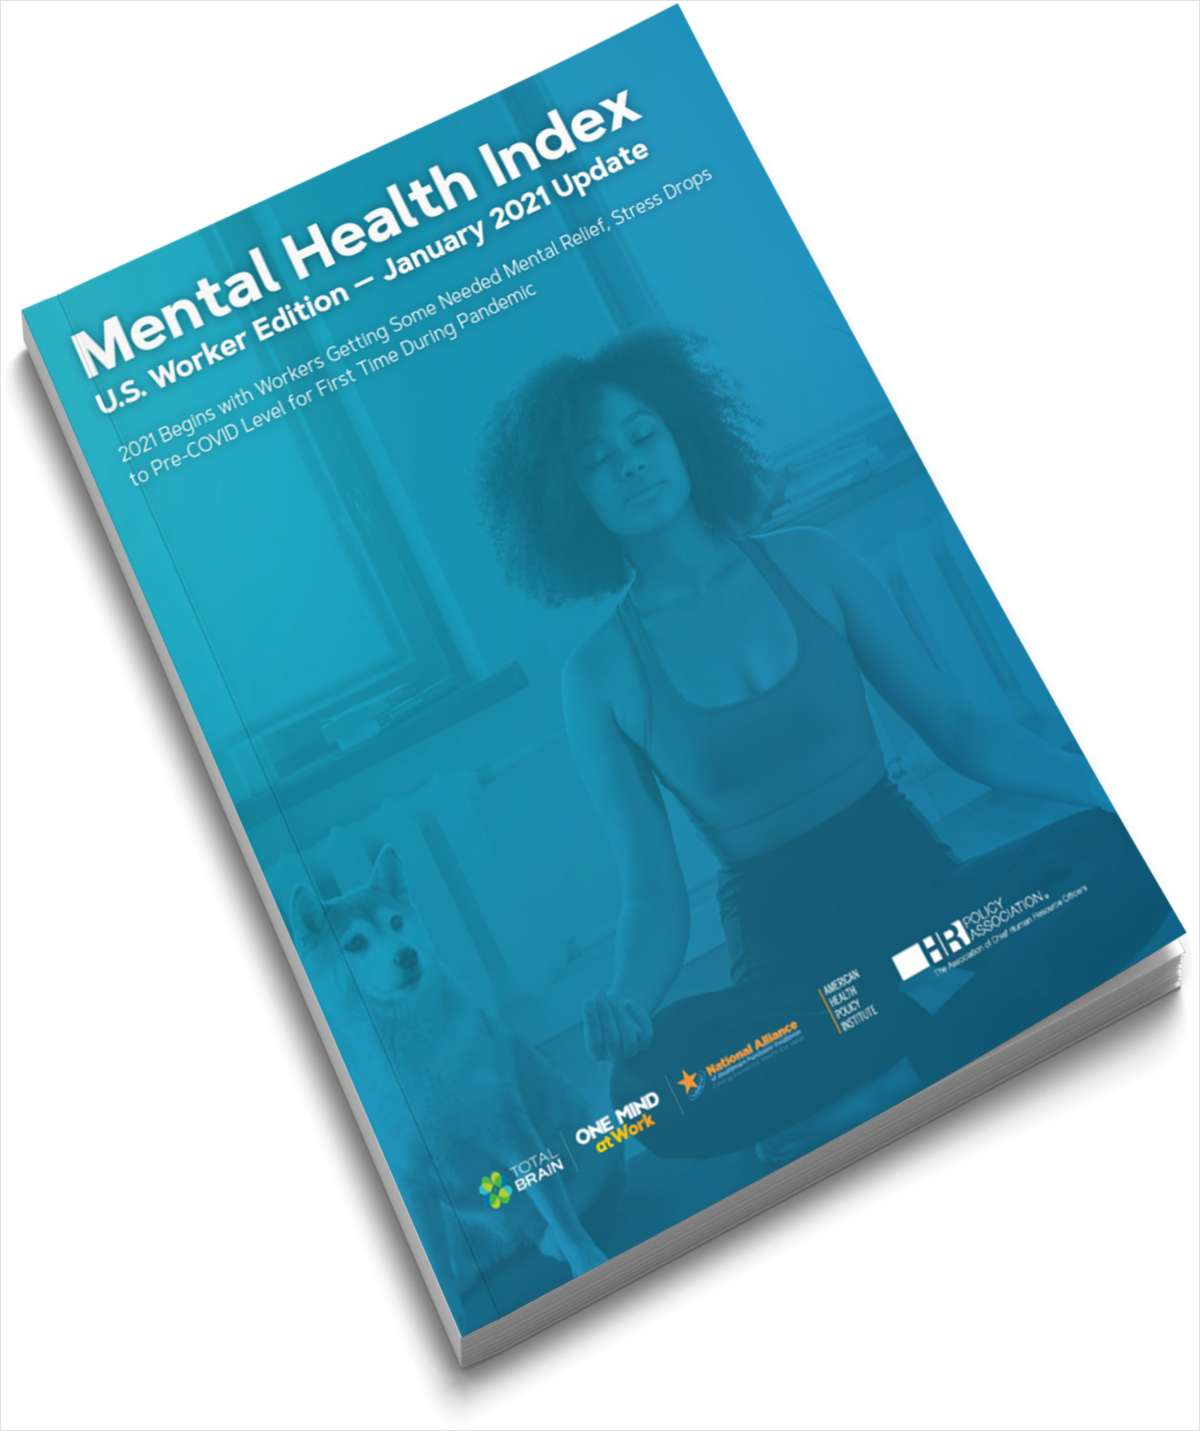 Mental Health Index - January 2021 Updates